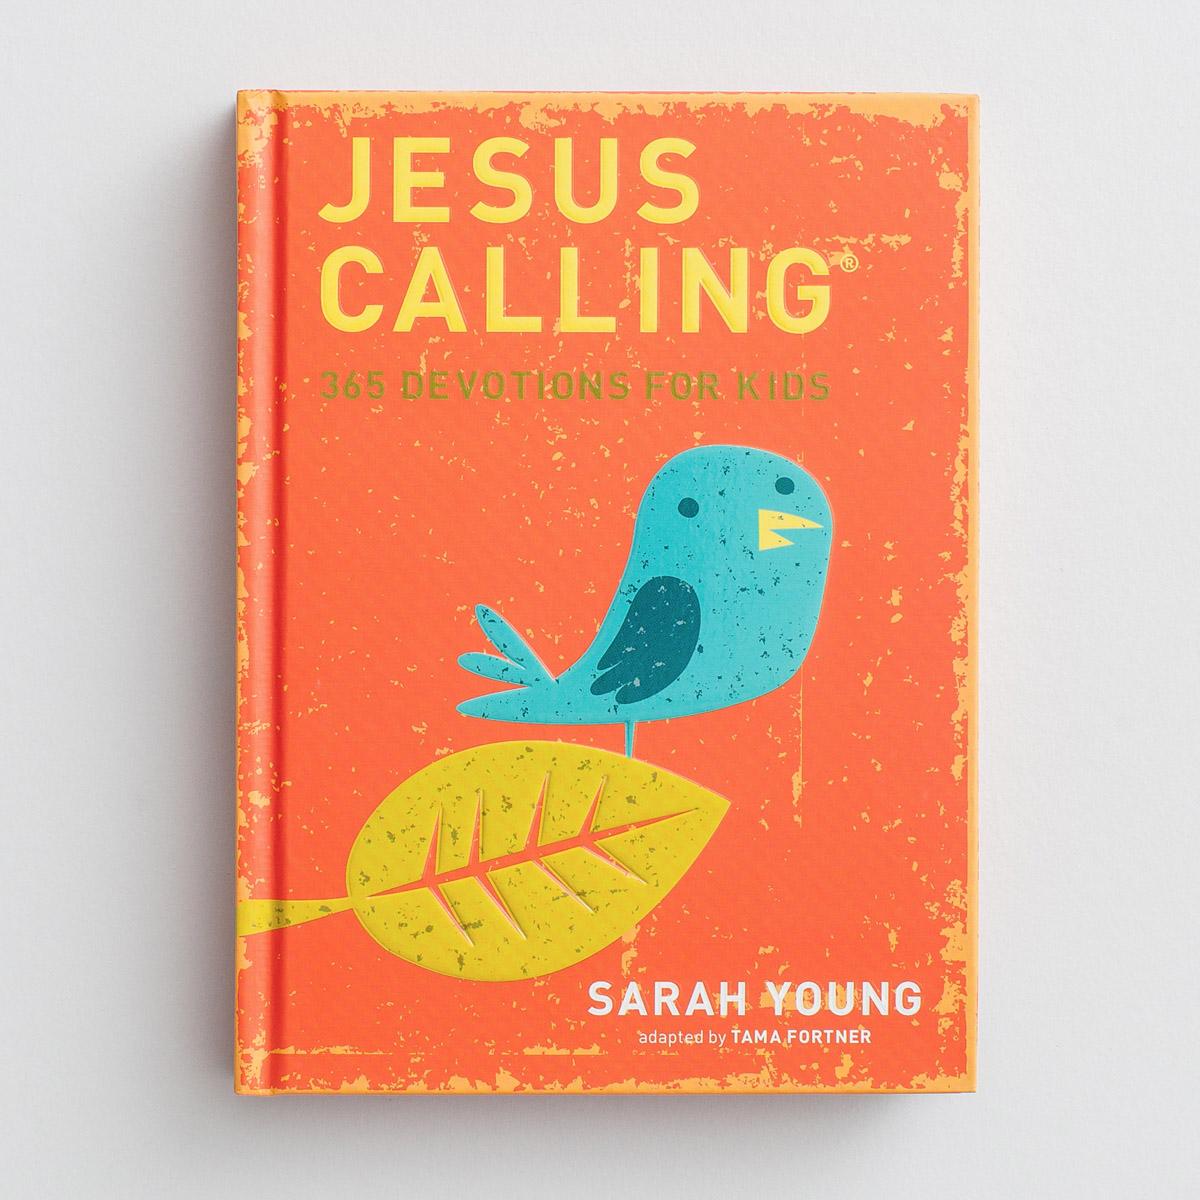 jesus calling online devotional pdf